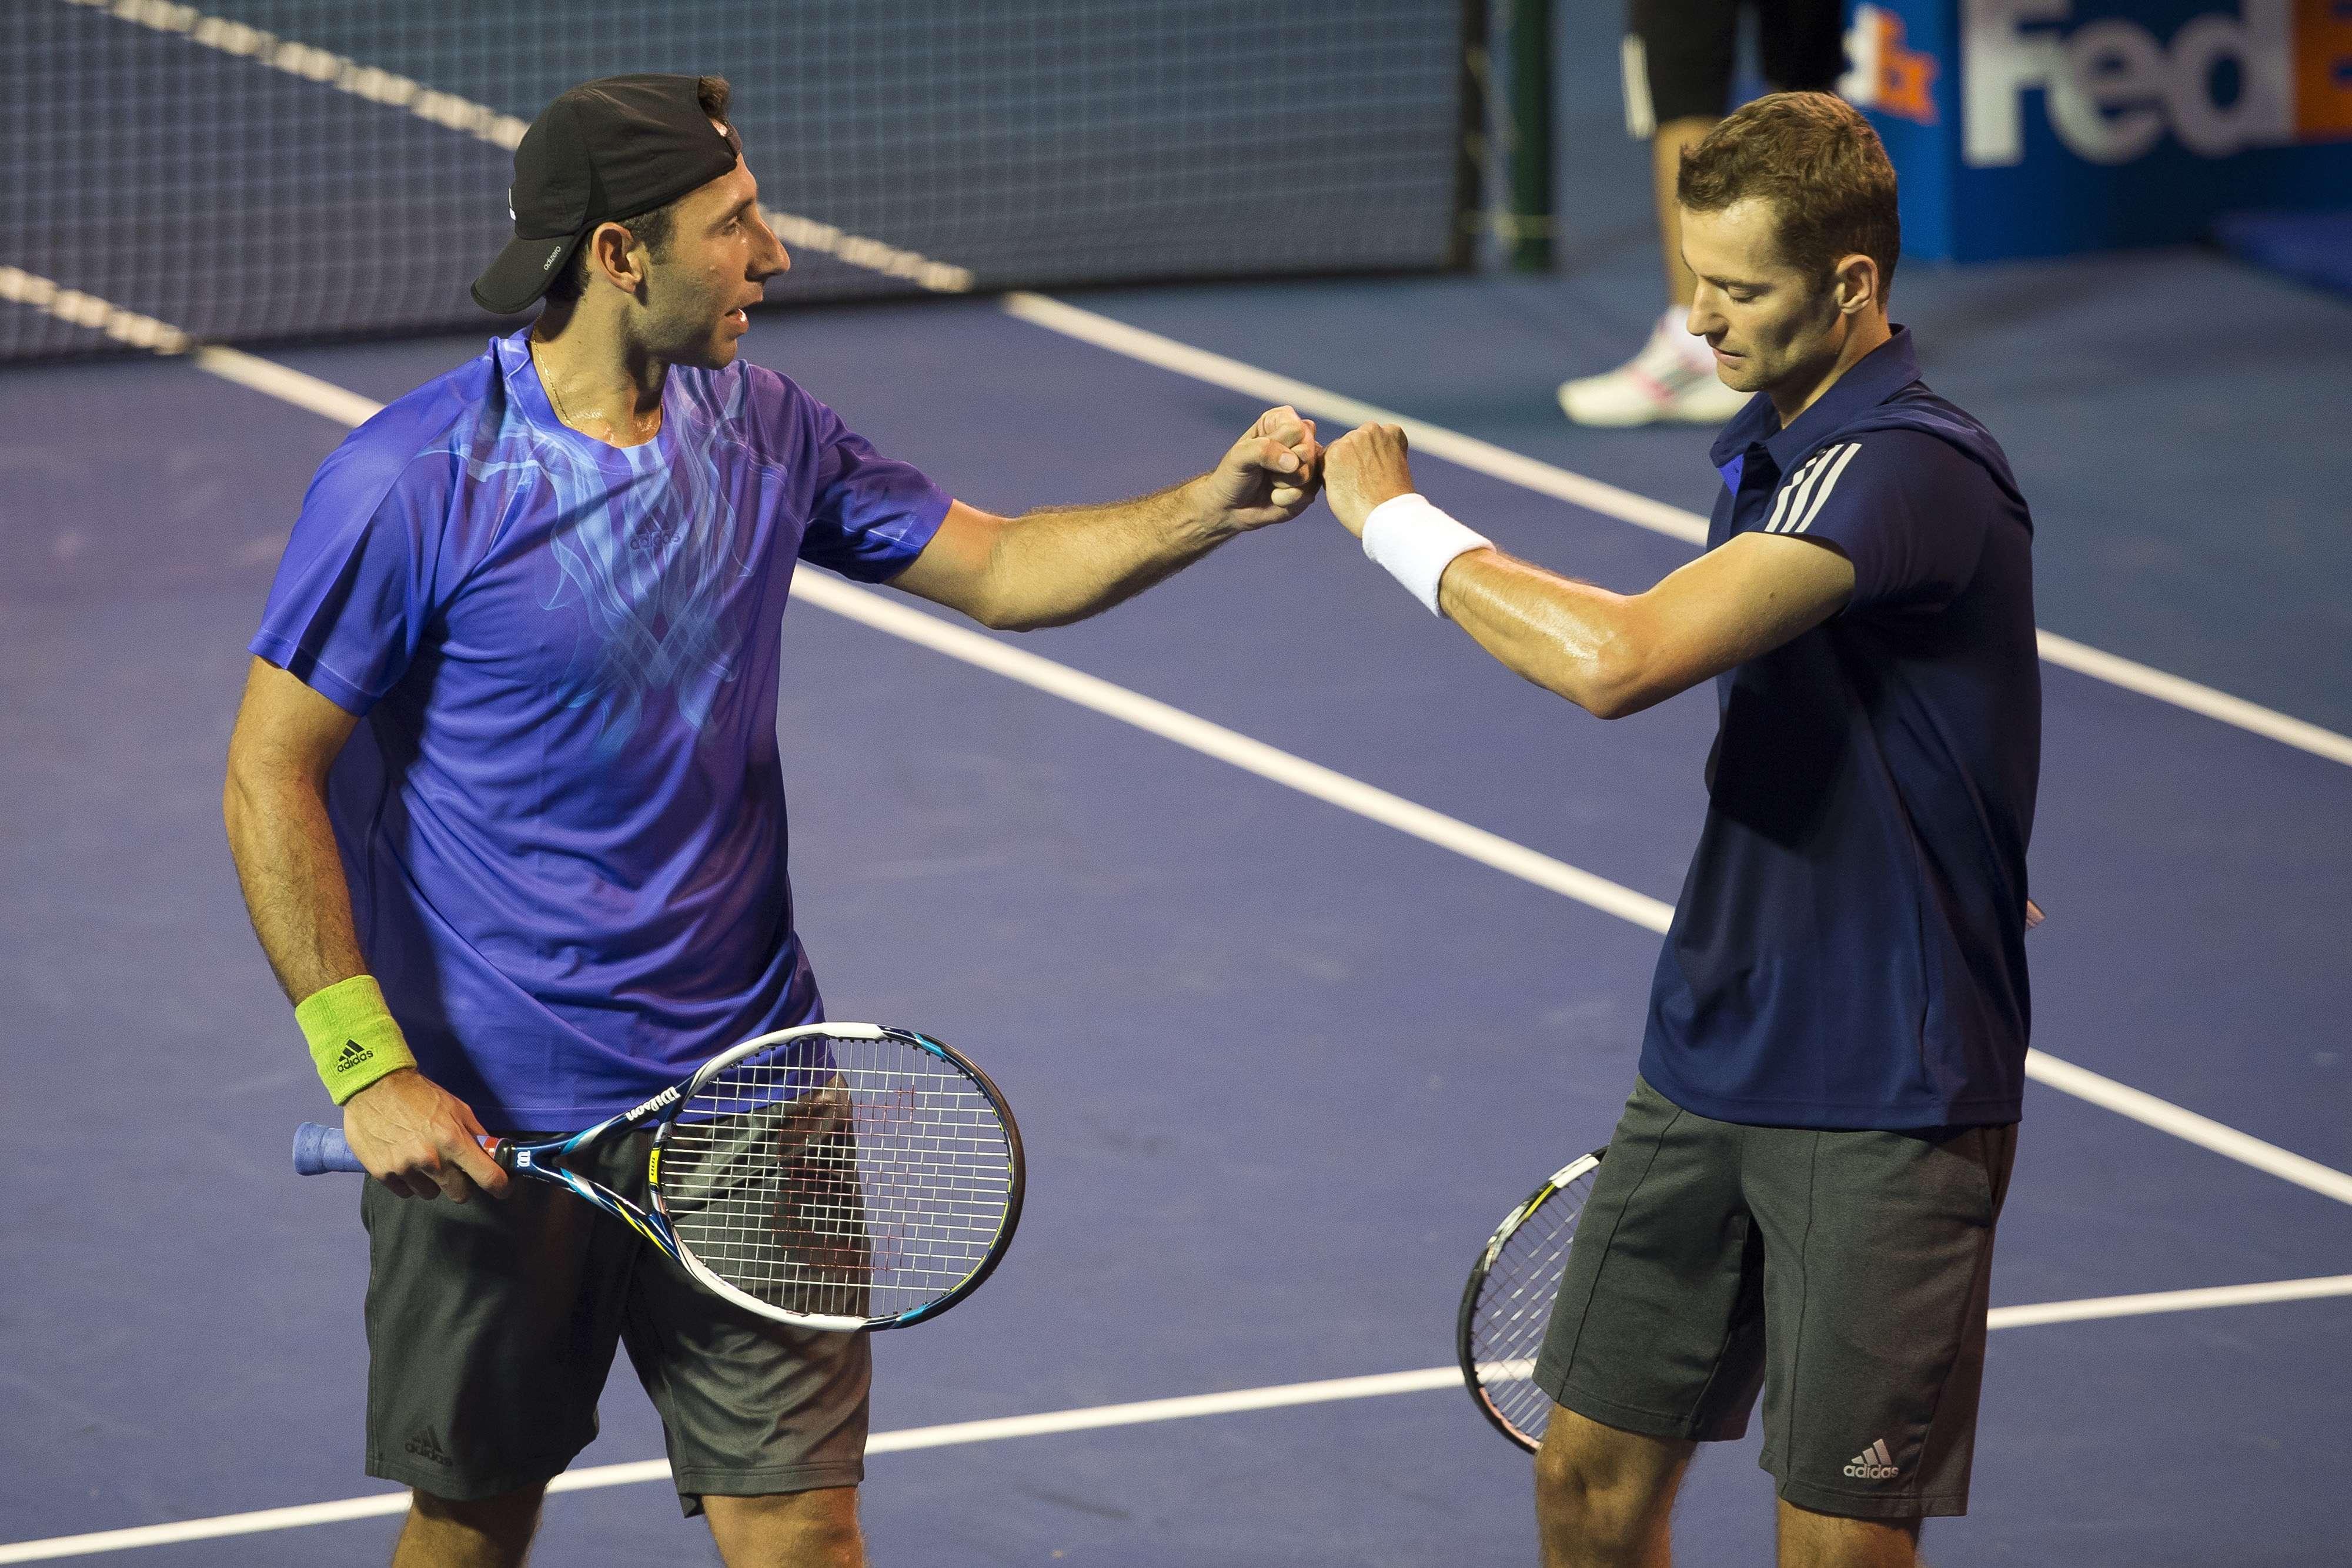 Santiago González y Mariuisz Fyrstenberg siguen cumpliendo con los pronósticos Foto: Mexsports